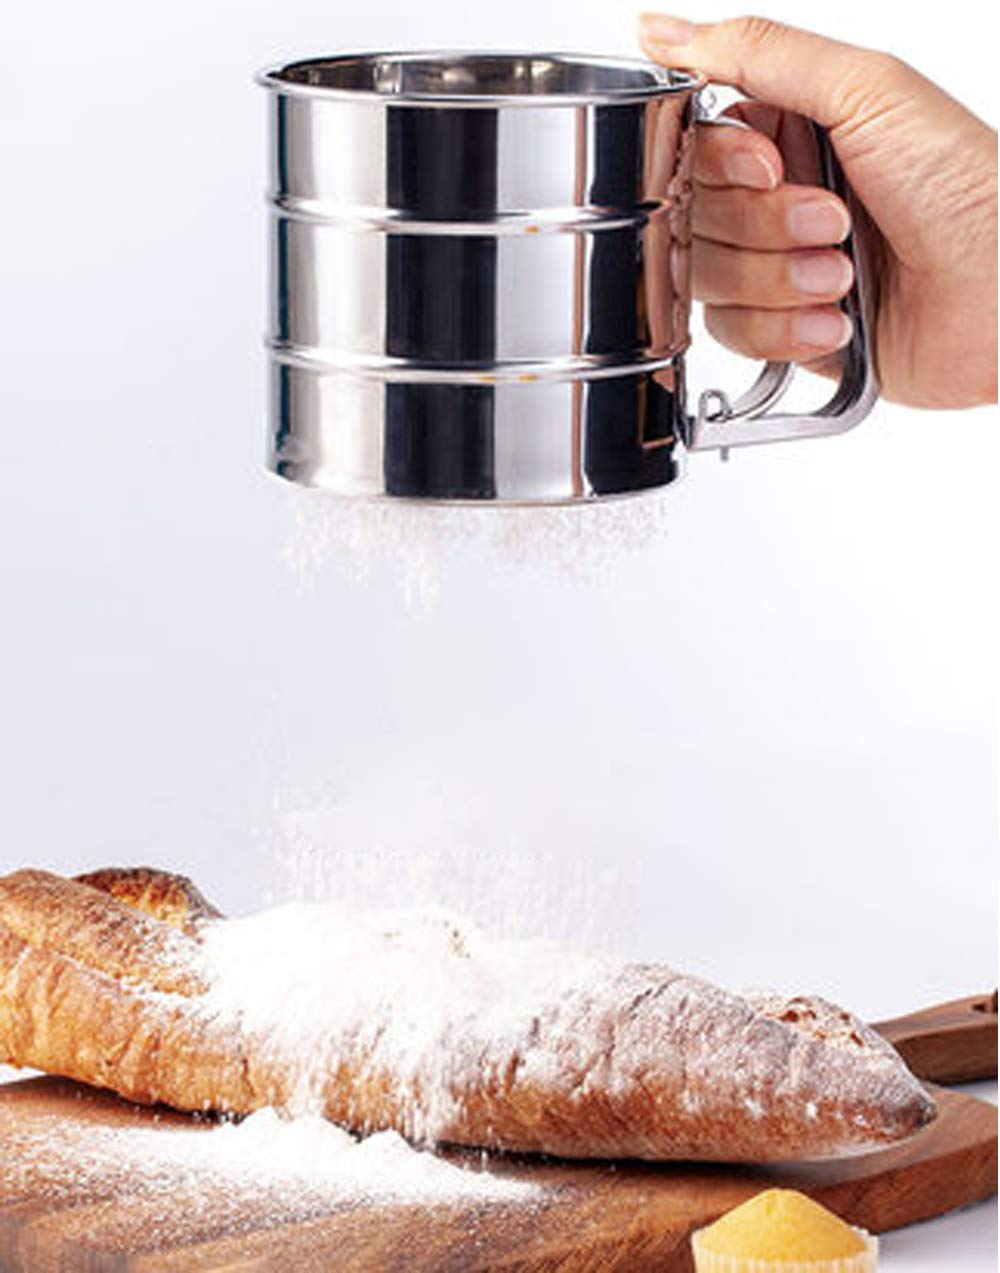 Tamiz de Cocina con Mango Tamiz de Acero Inoxidable para Espolvorear y Espolvorear Finamente Mein HERZ Tamizador Cribador de Harina para 250 Gramos de Harina//Az/úcar en Polvo 15,5/×10,6/×9,5 cm